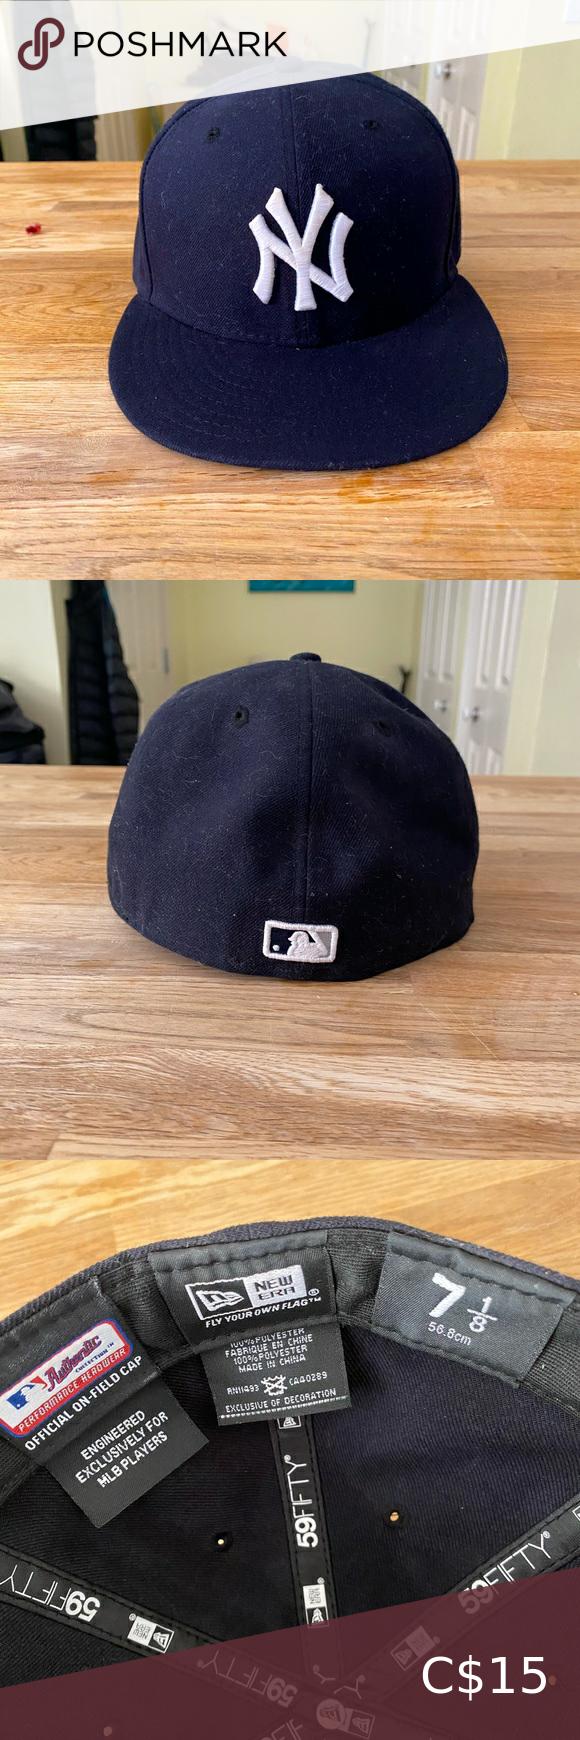 Fifty Nine Edition New York Yankee Cap New Era Hats New York Cap New Era